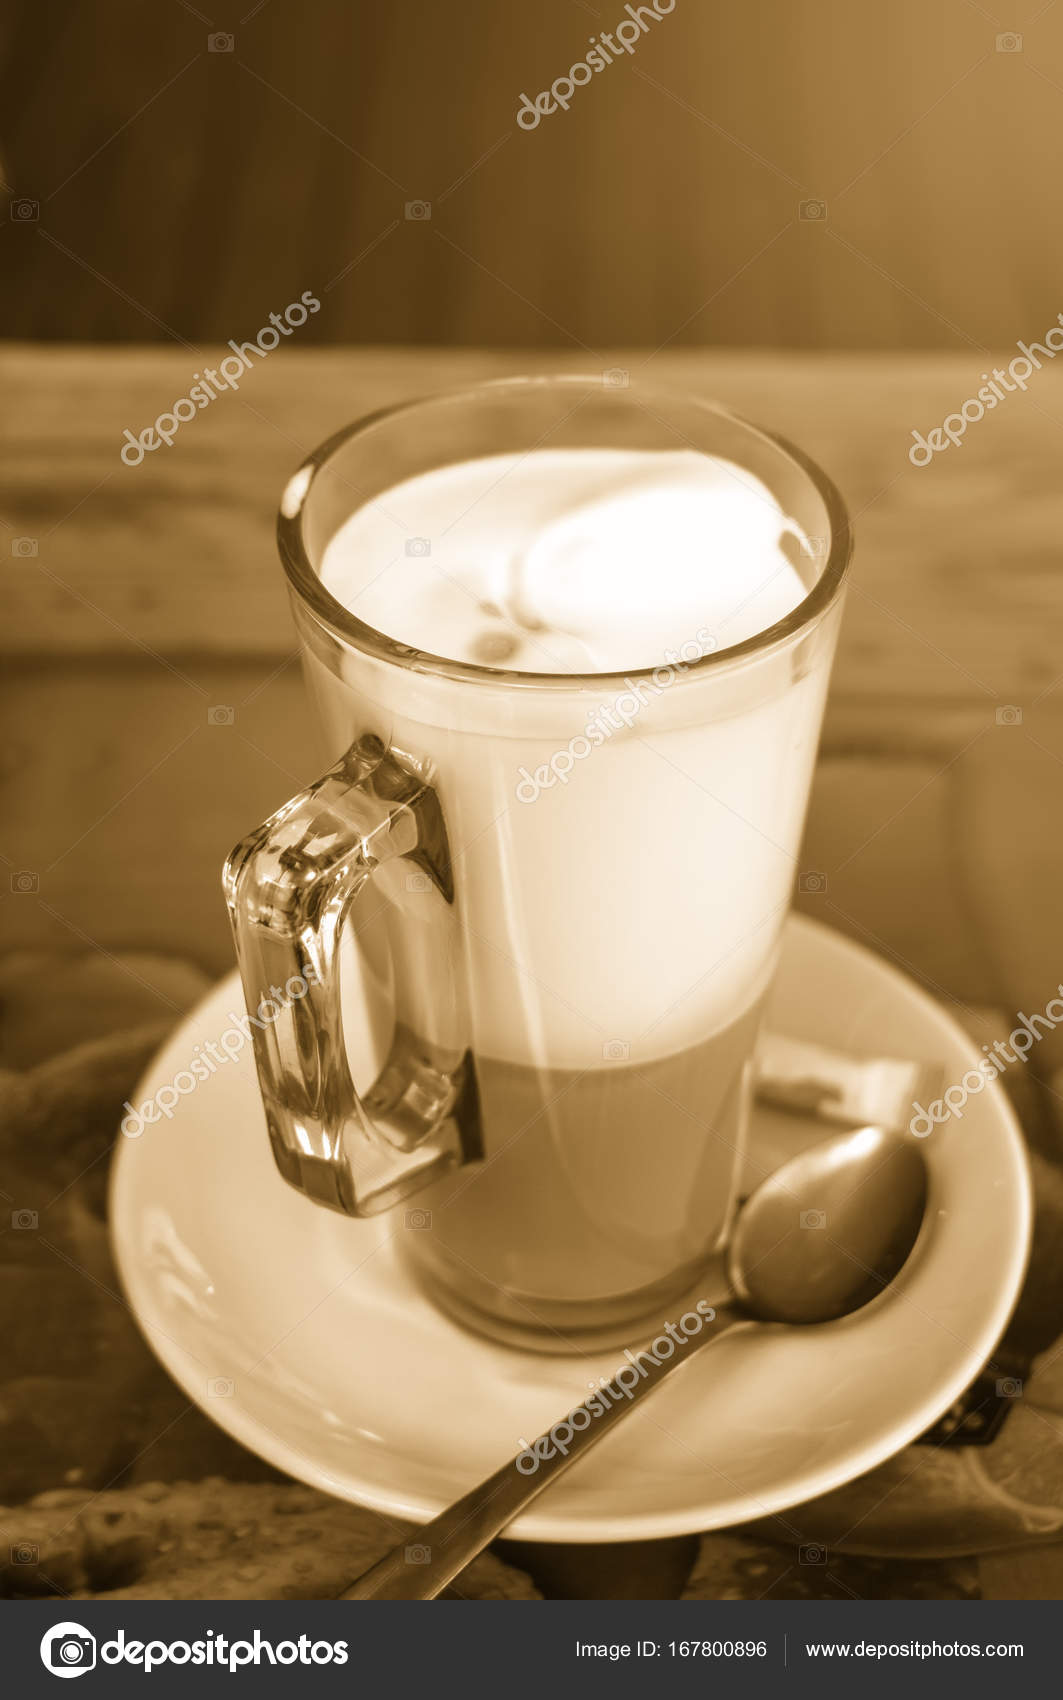 koffie vetverbranding